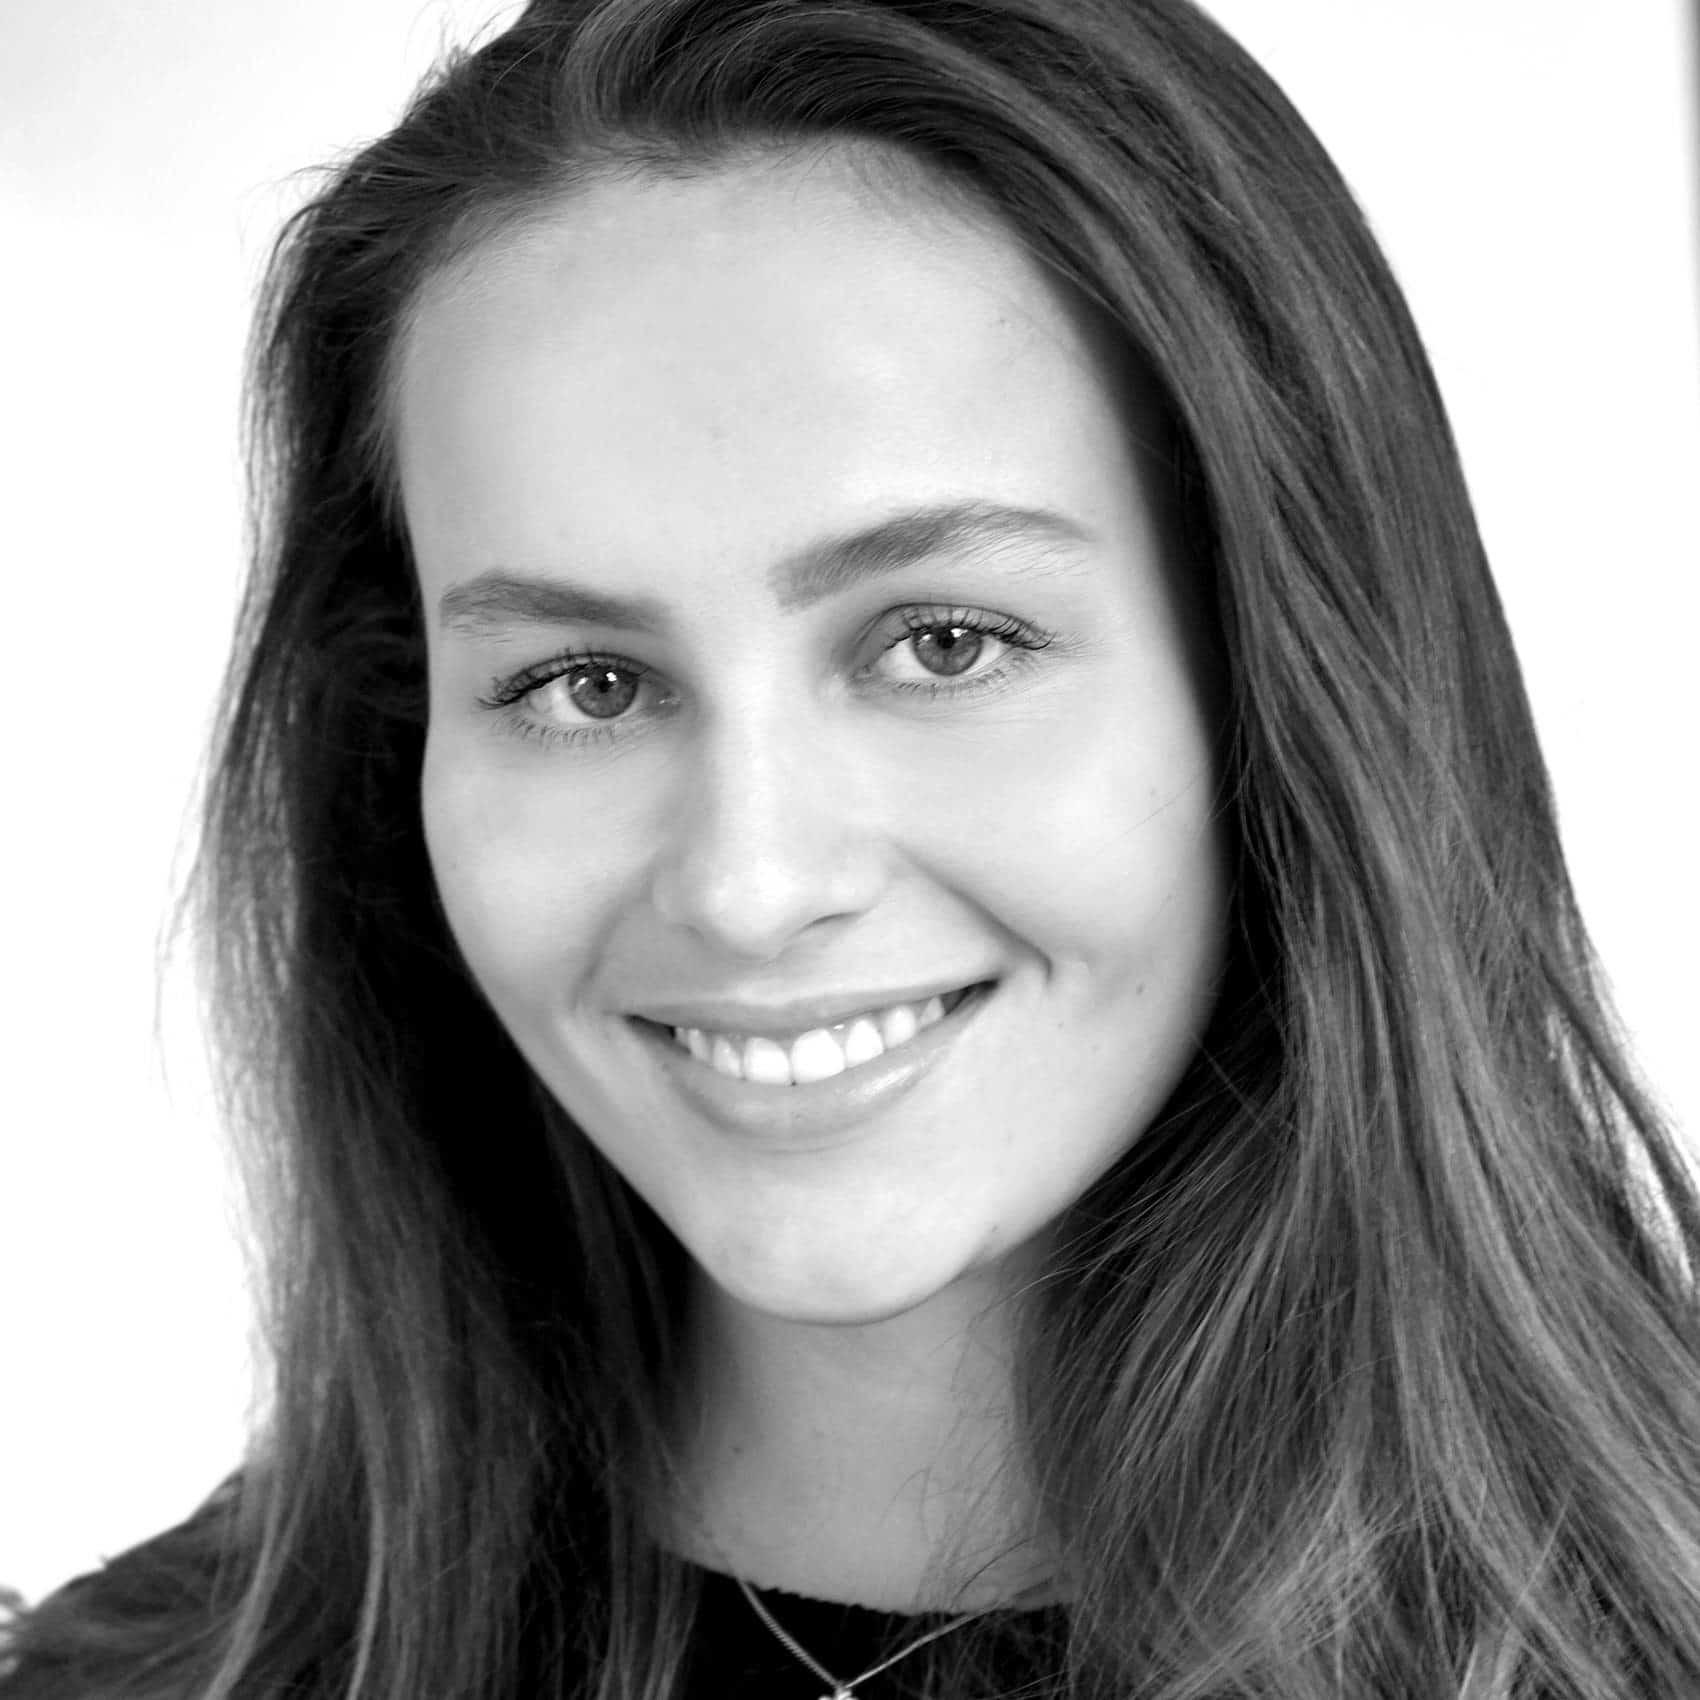 Veronika Murr